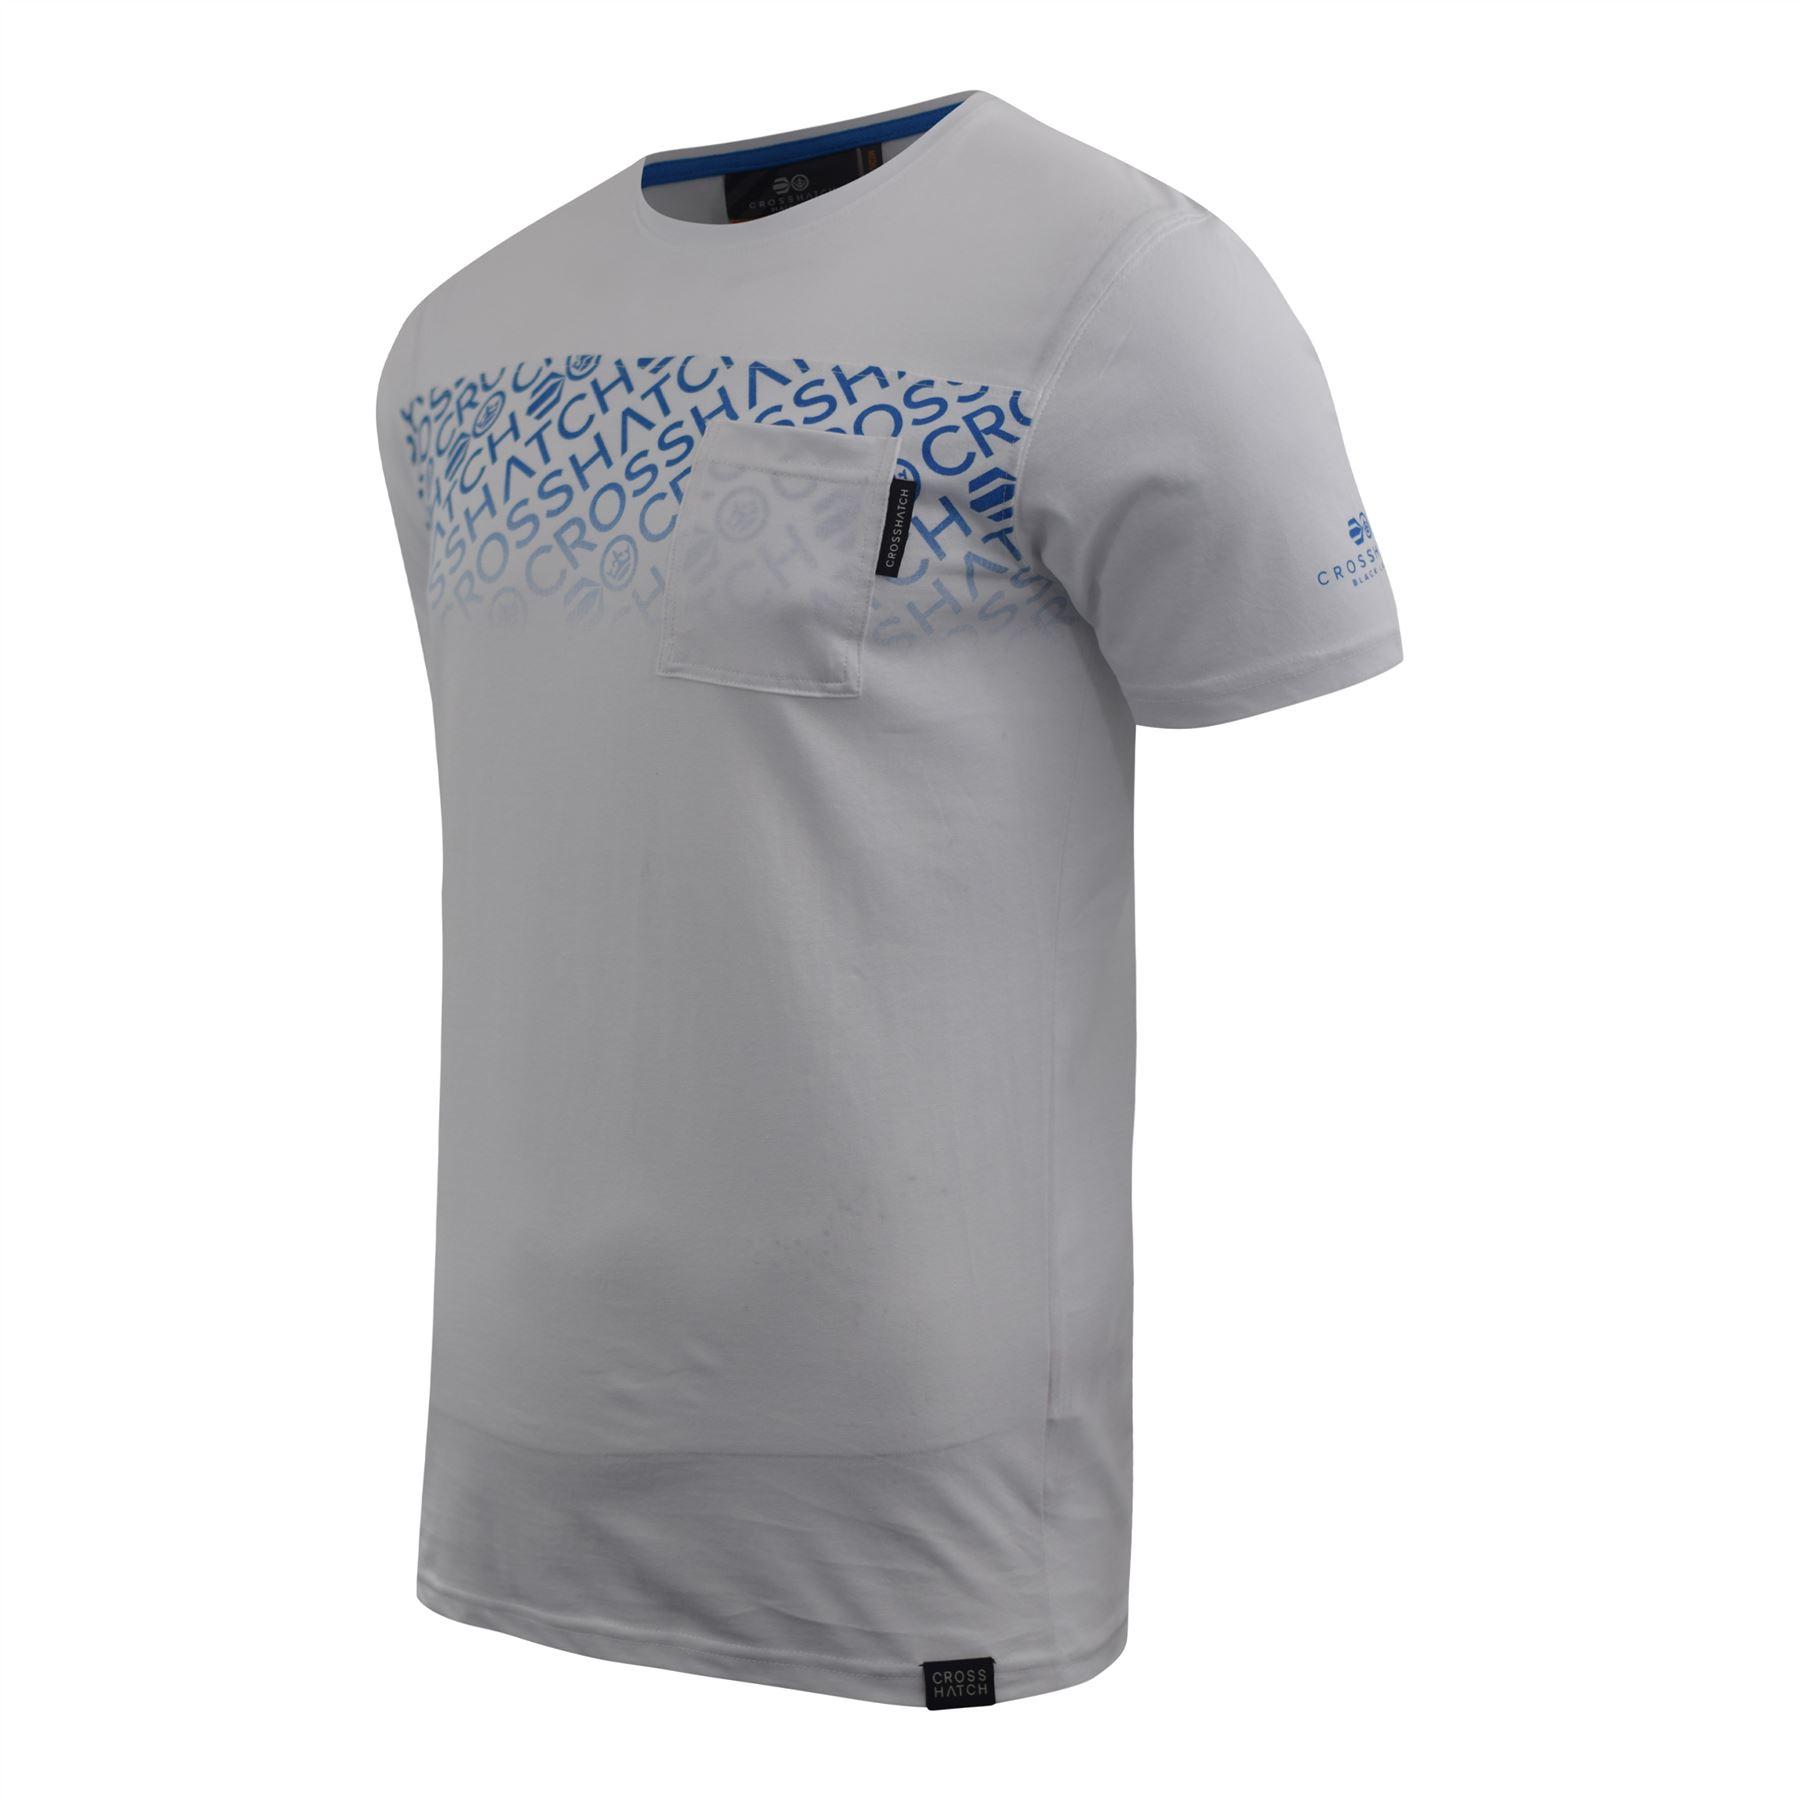 Mens-Crosshatch-T-shirt-Contrast-Graphic-Print-Top-Tee-Westfan thumbnail 9